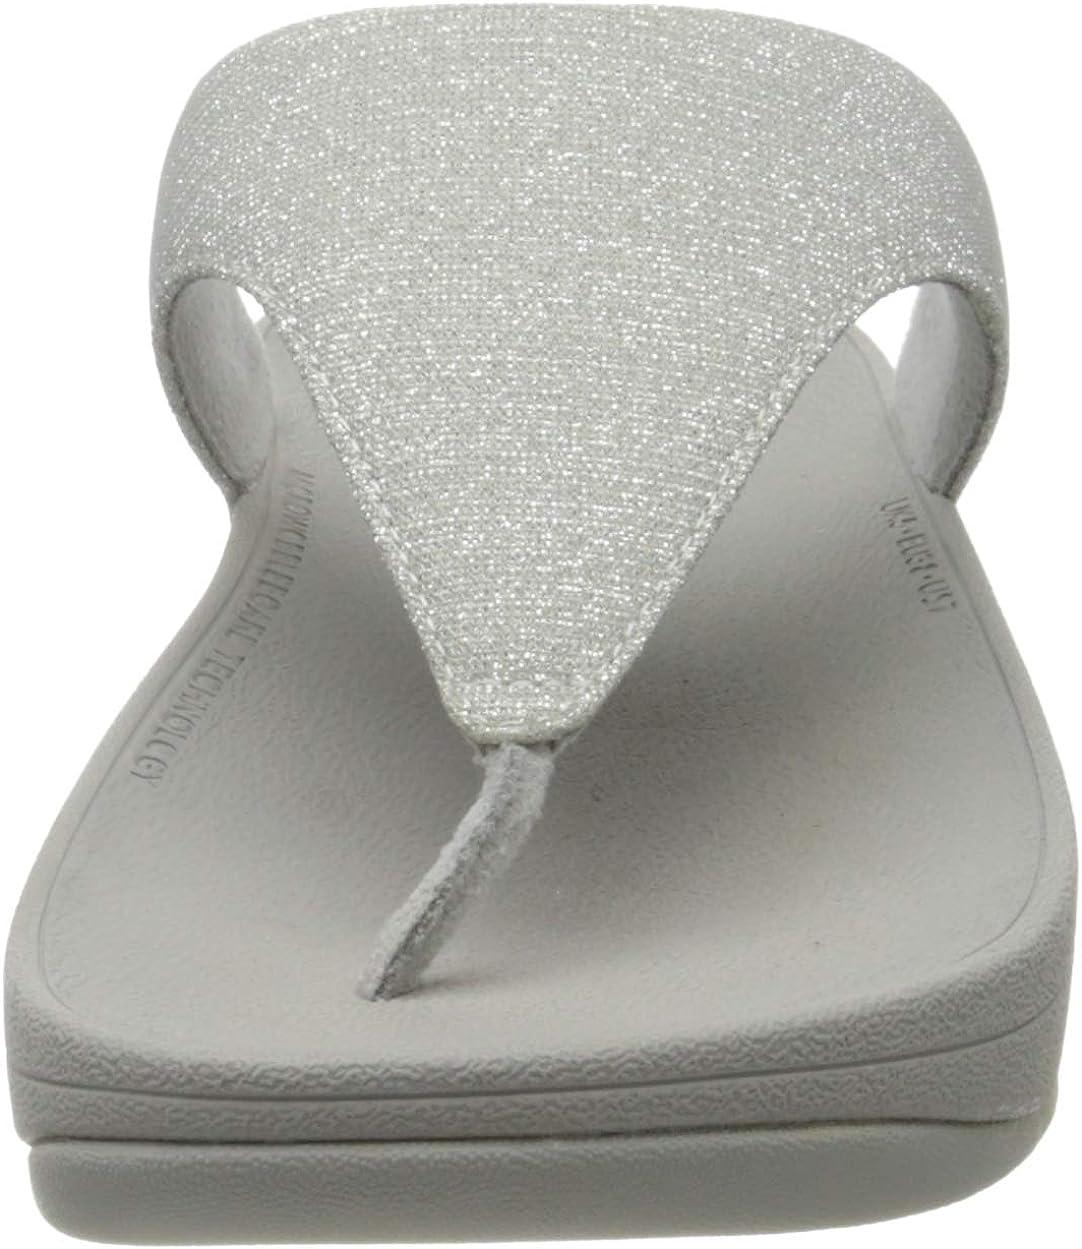 Fitflop Lottie Toe Post-holiday Glitz, Sandales Bout Ouvert Femme Argenté Silver 011